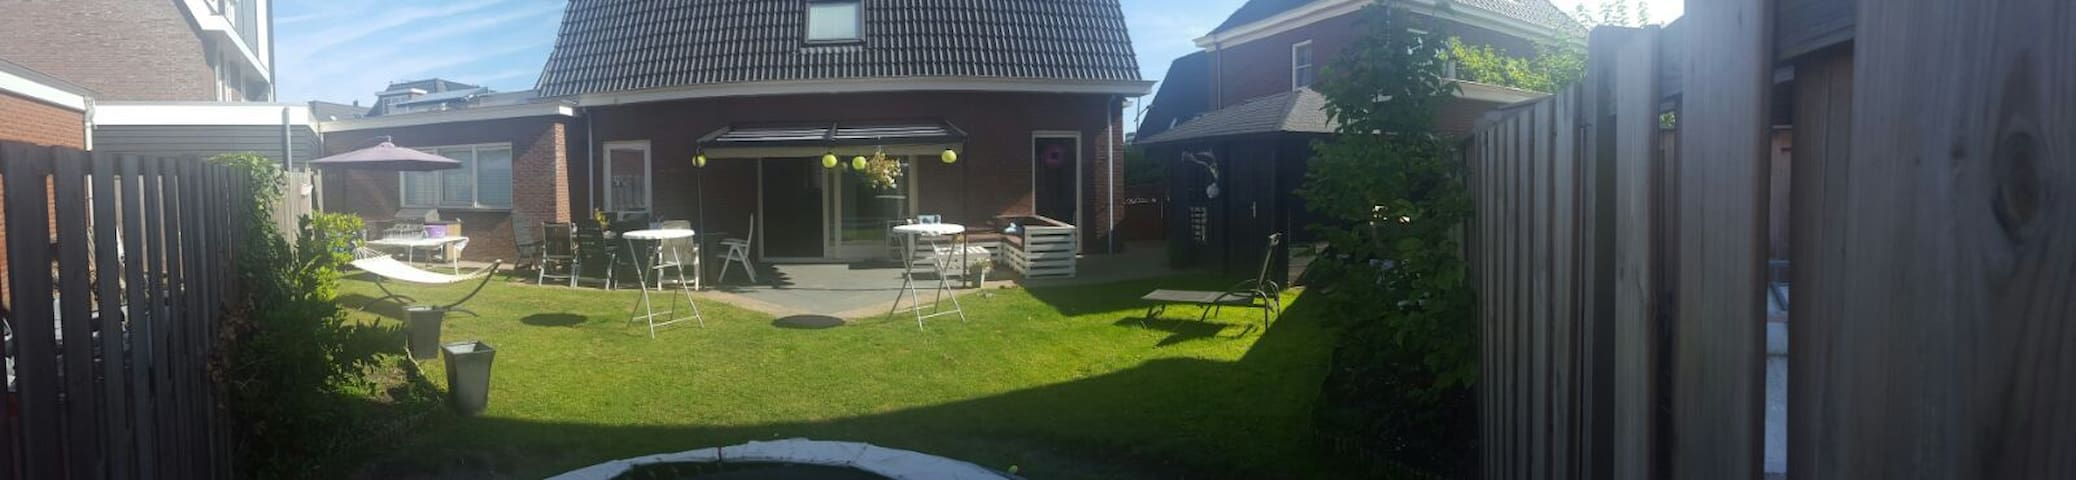 Wonderful house with sunny garden near Amsterdam - Assendelft - Villa